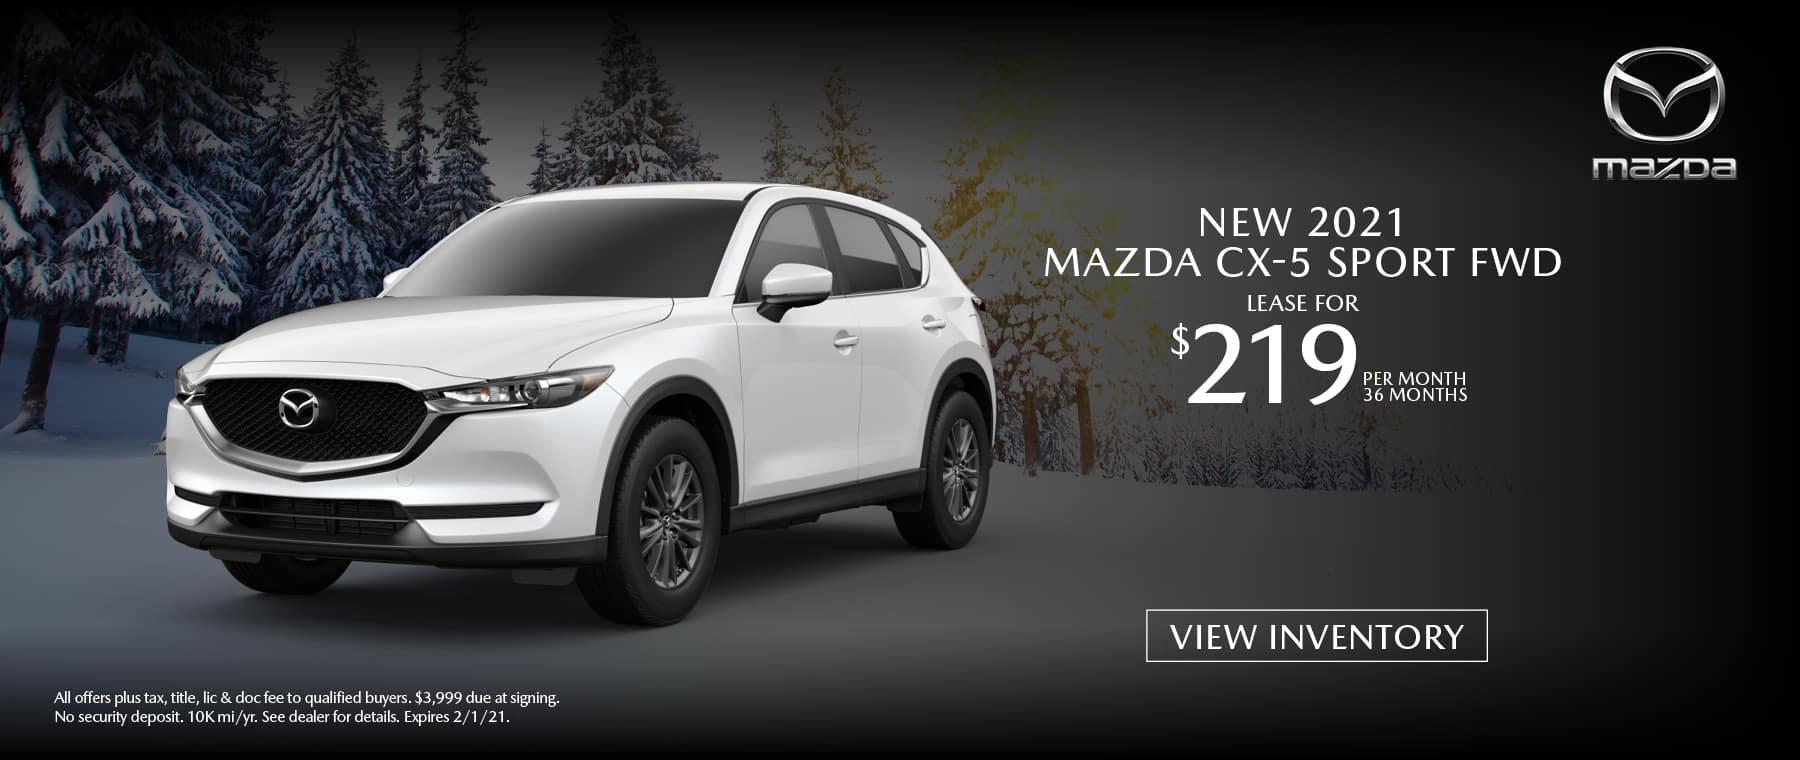 PUGI-MAZ-CX5-SPT-$219-JAN-1800×760